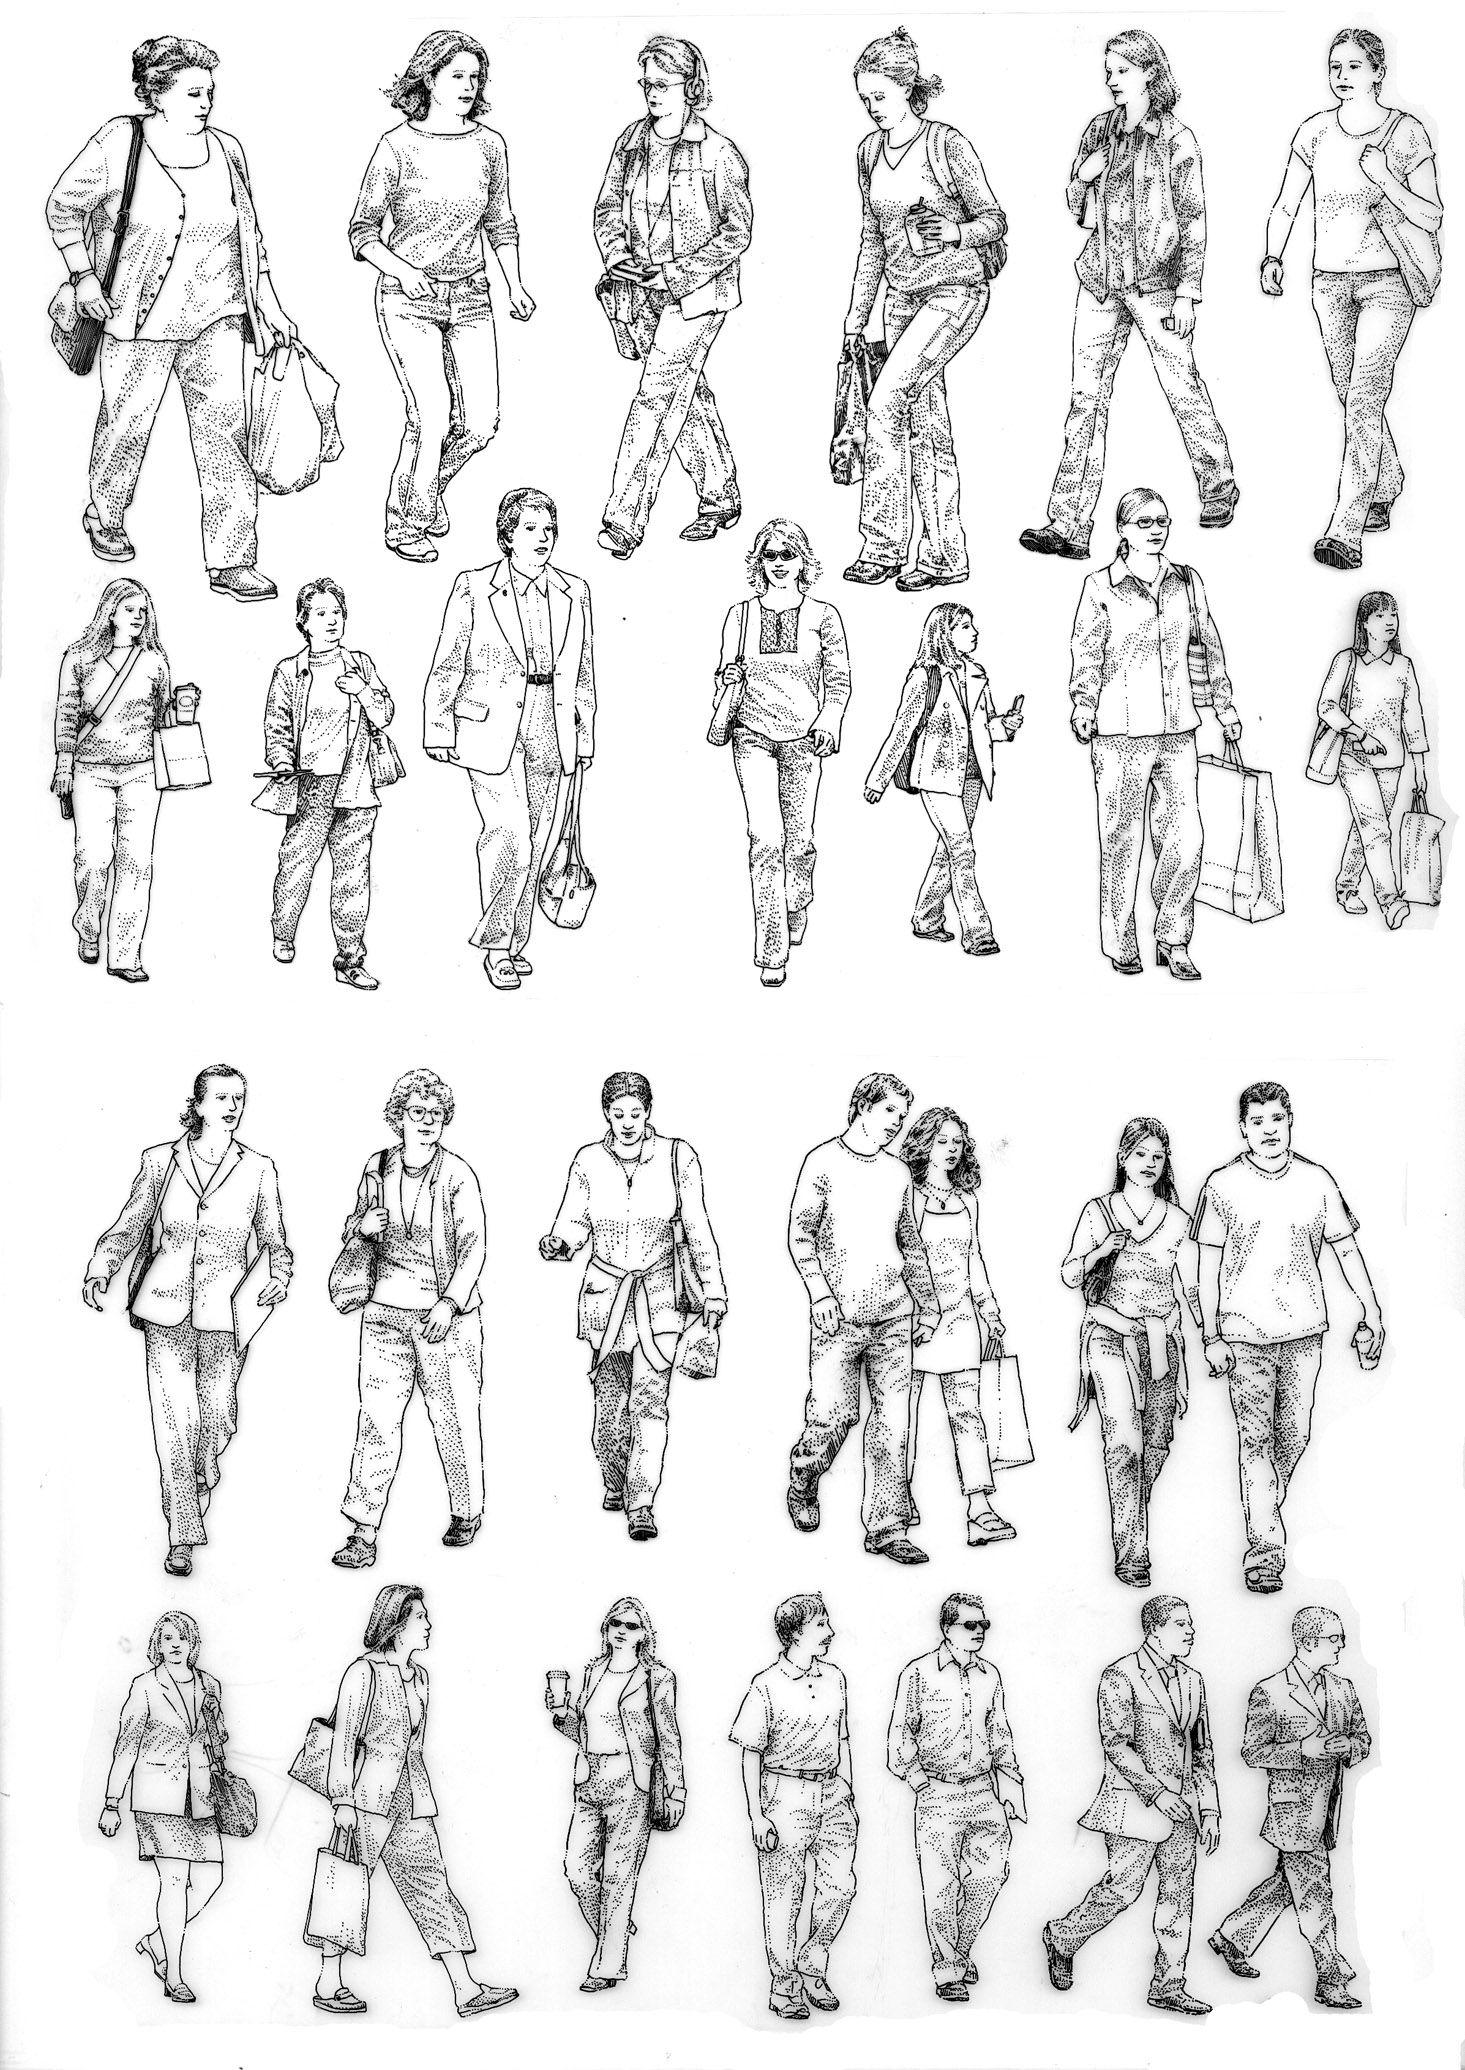 Entourage_samplepage2 sketches of people human figure